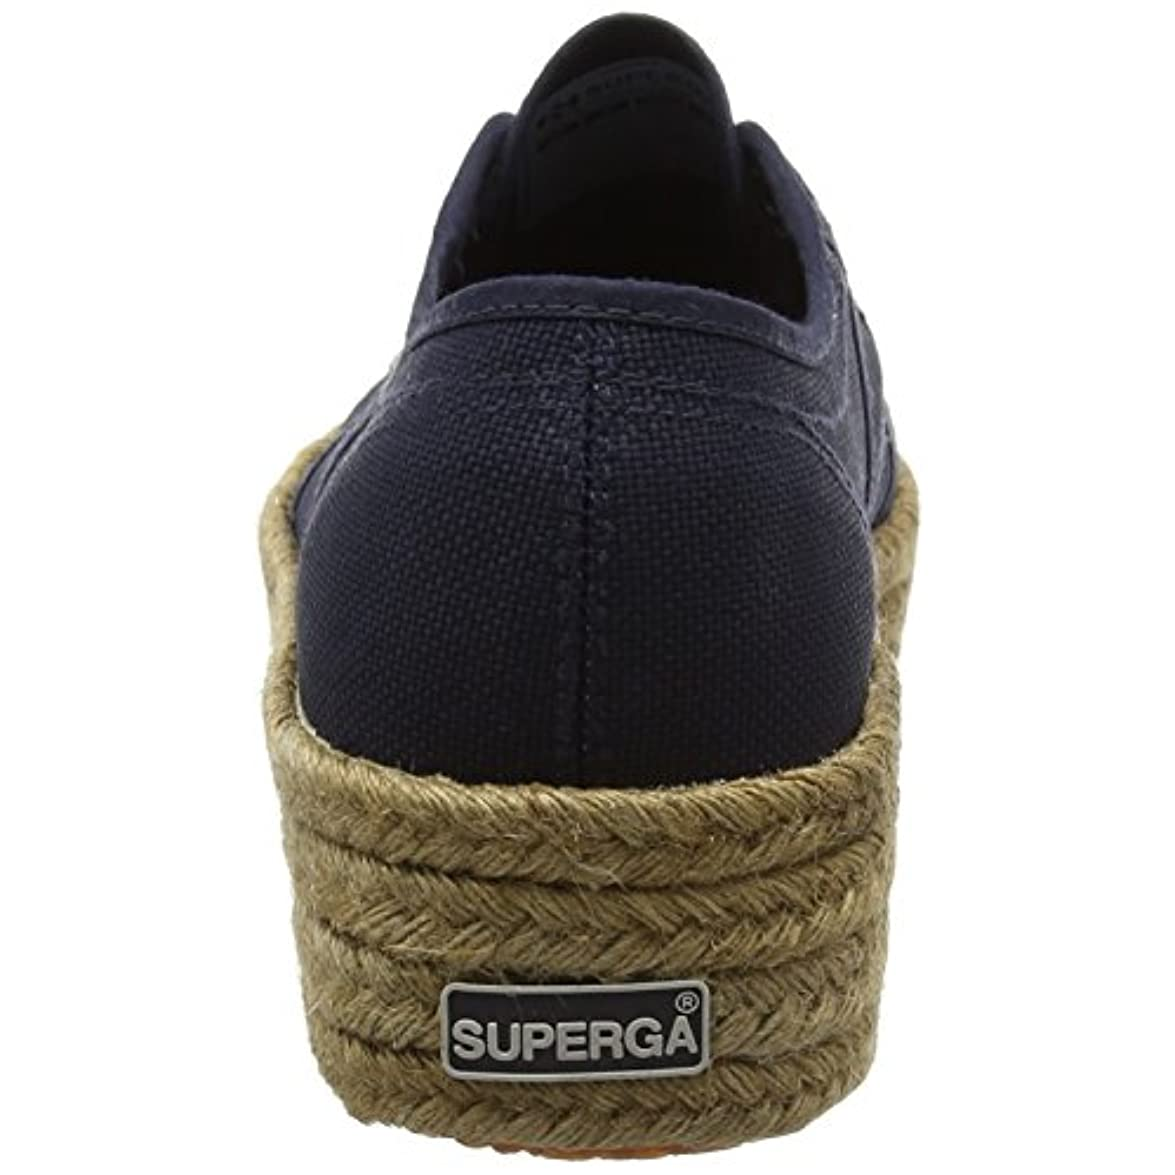 Cotropew Superga 2790 Cotropew 2790 Superga 2790 Superga